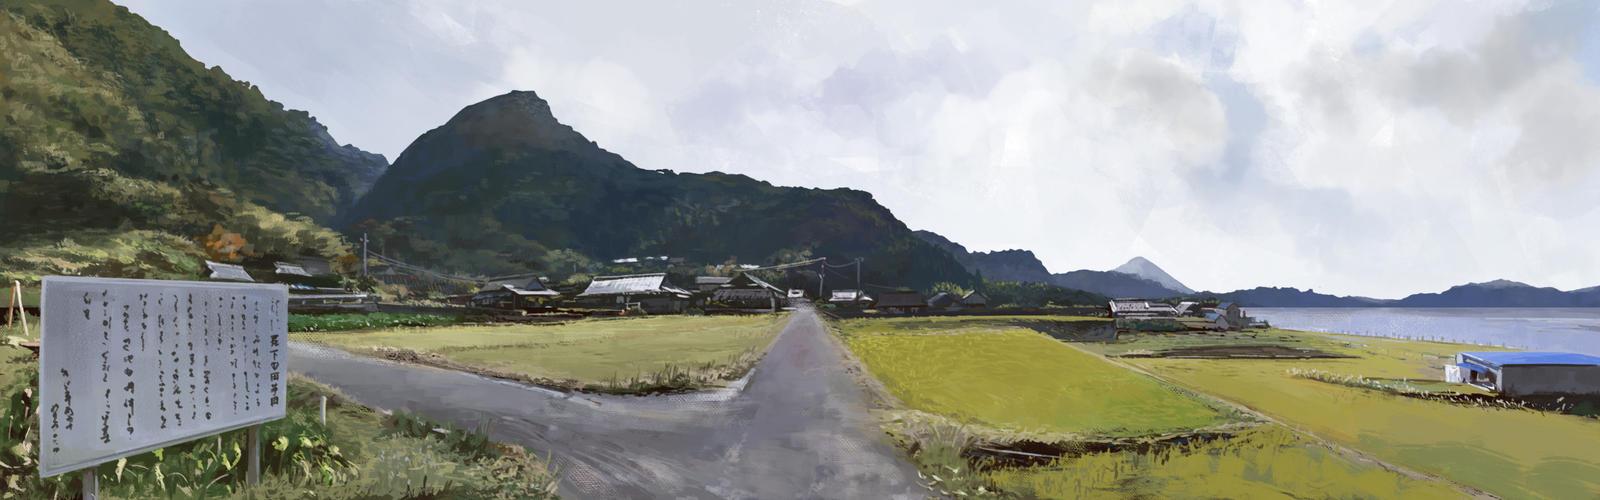 Lake Ikeda - Kyushu by alantsuei